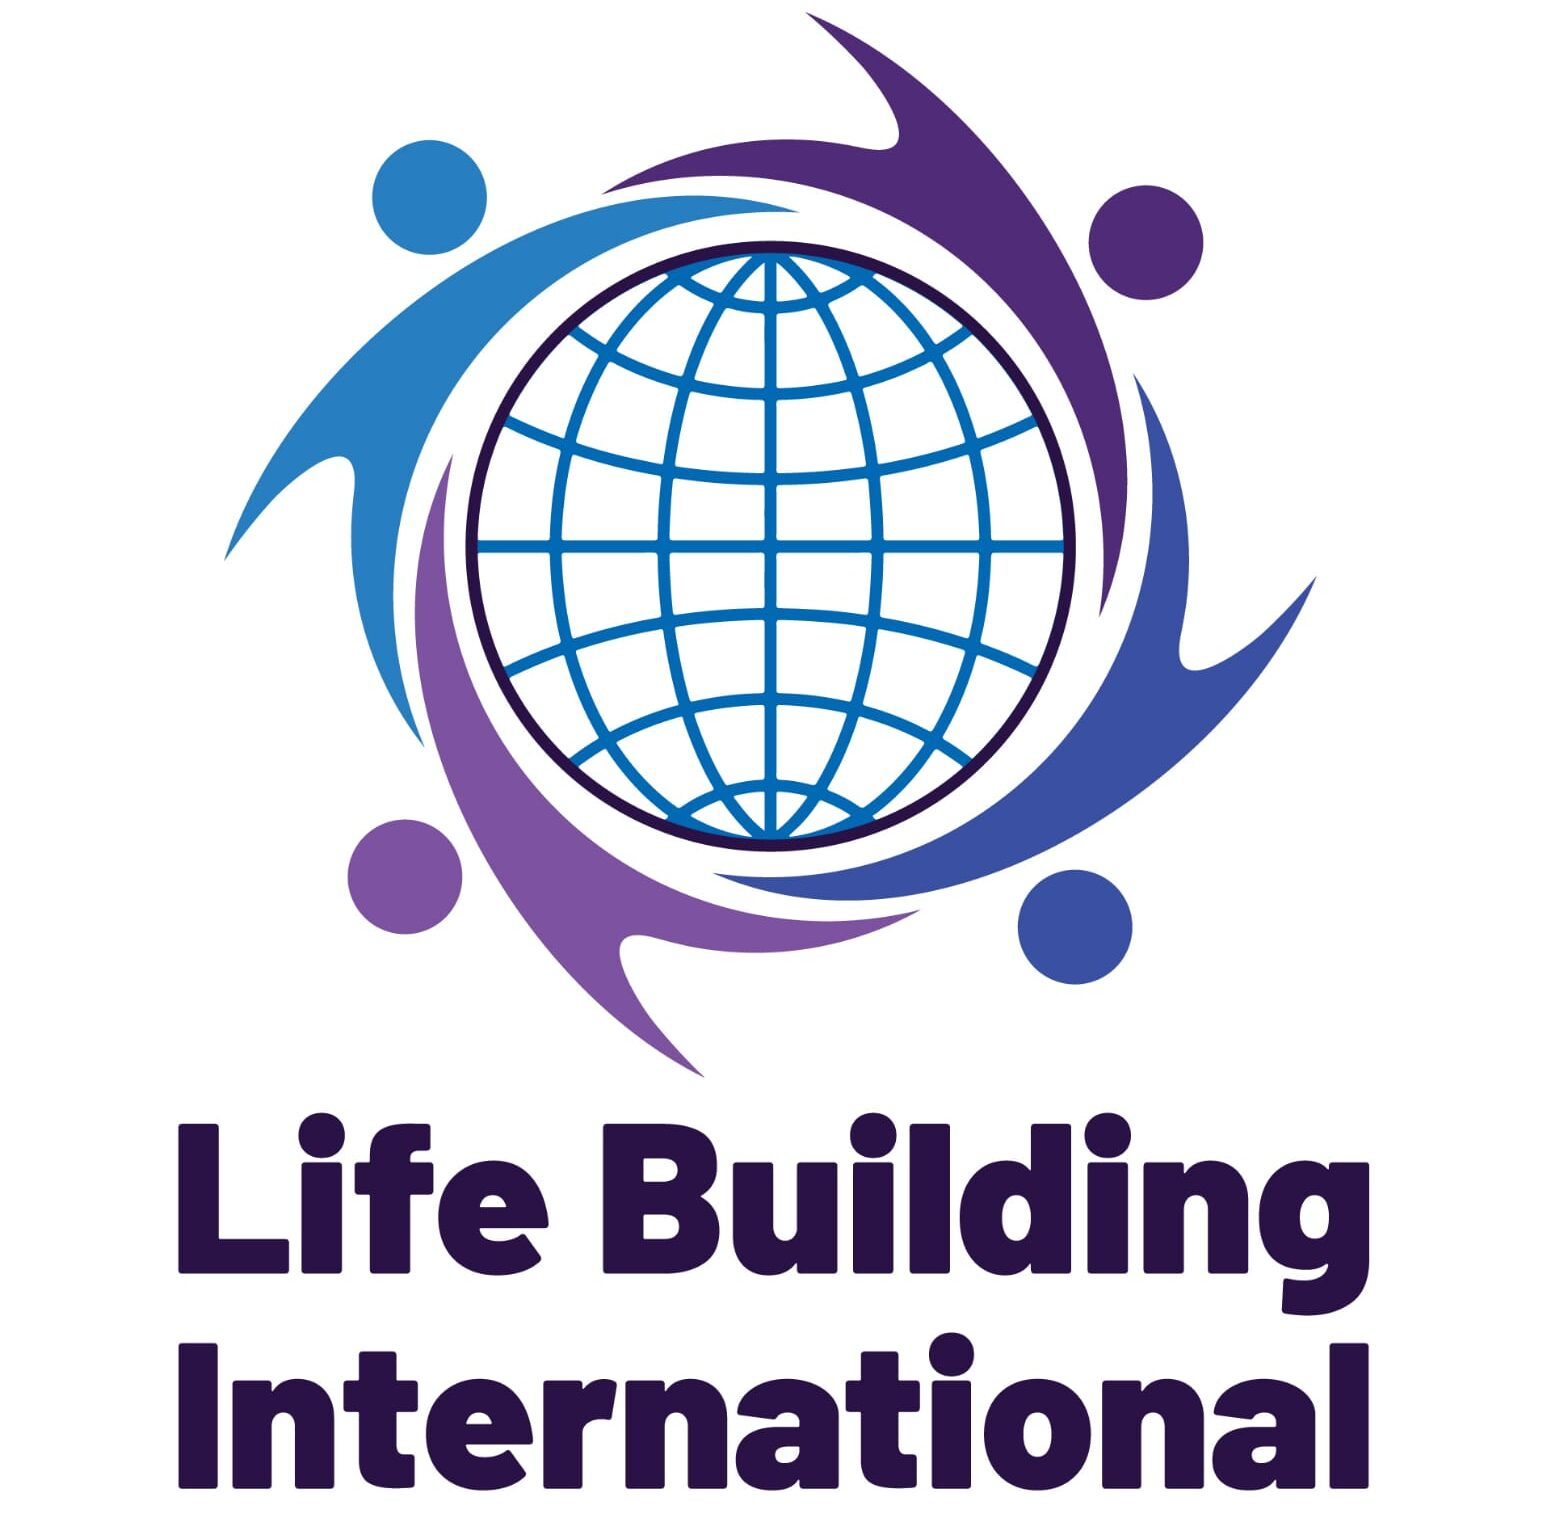 Life Building International